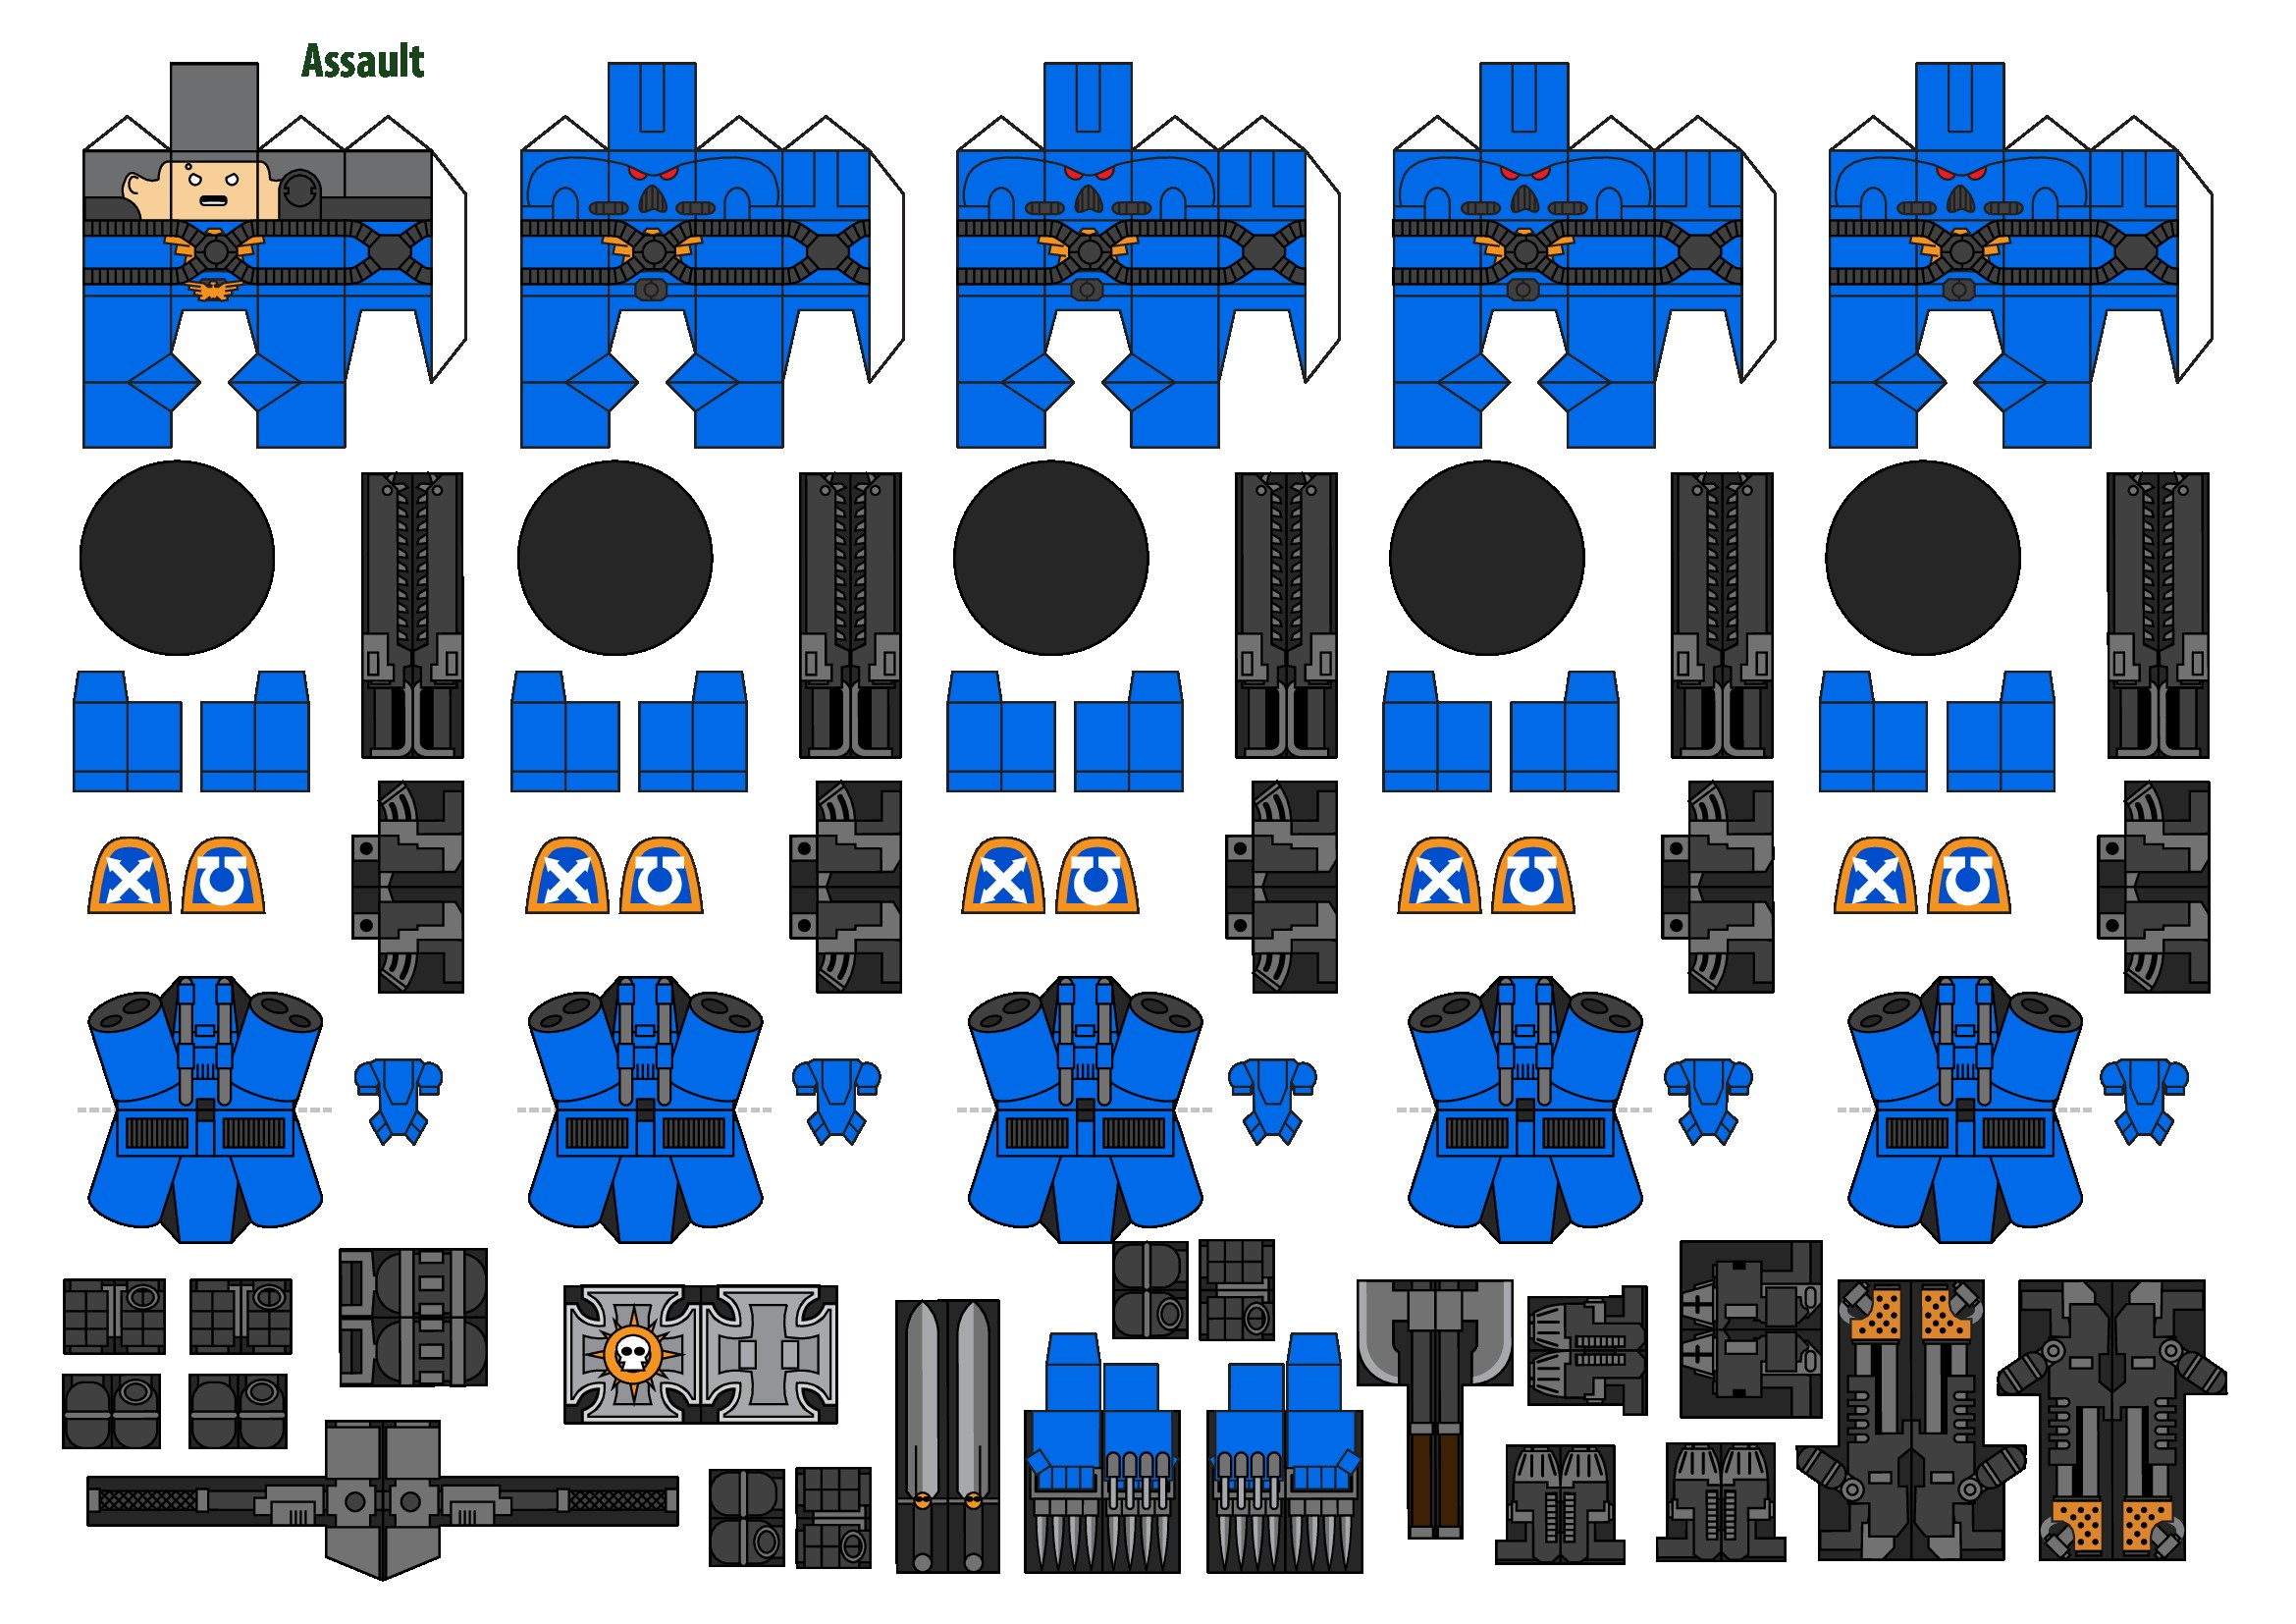 Warhammer 40k Papercraft Wh Papercraft Wh Conversion Miniatures Wh Warhammer